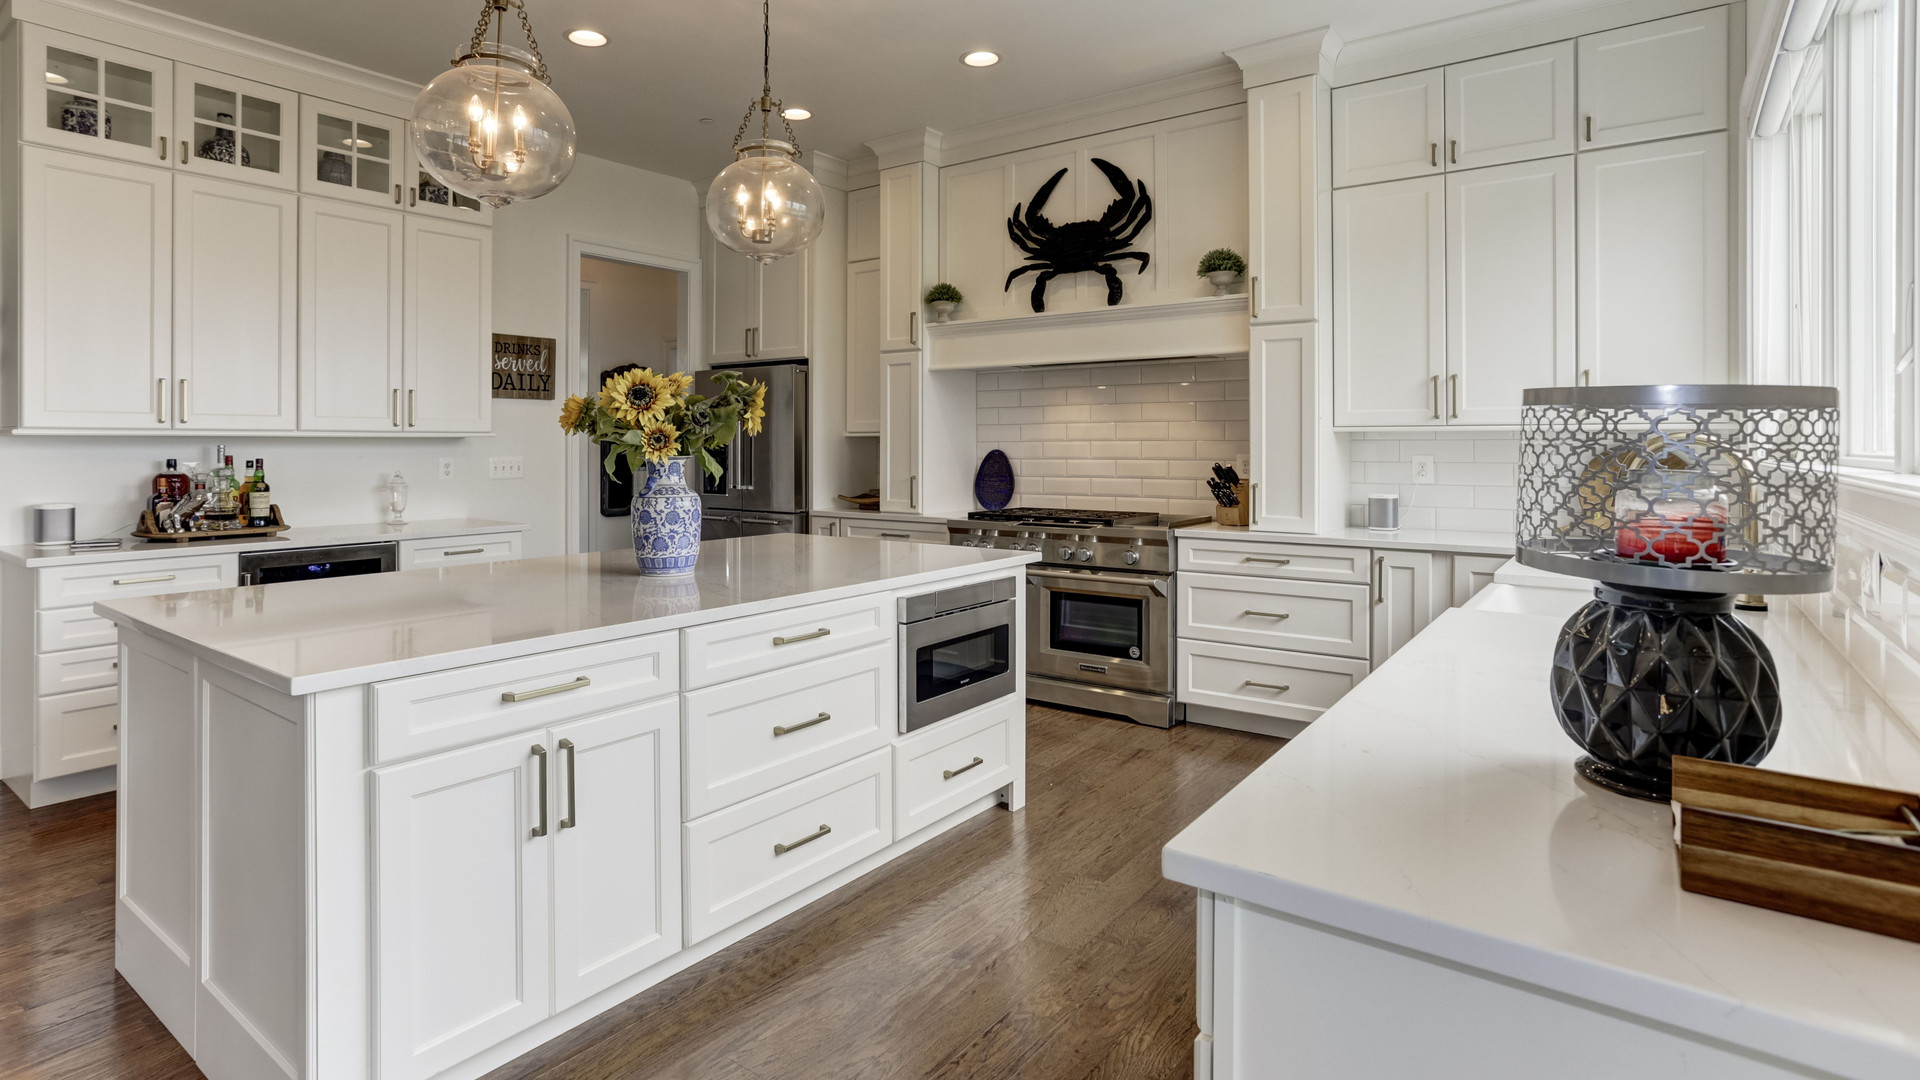 Custom kitchen design in Grasonville, MD